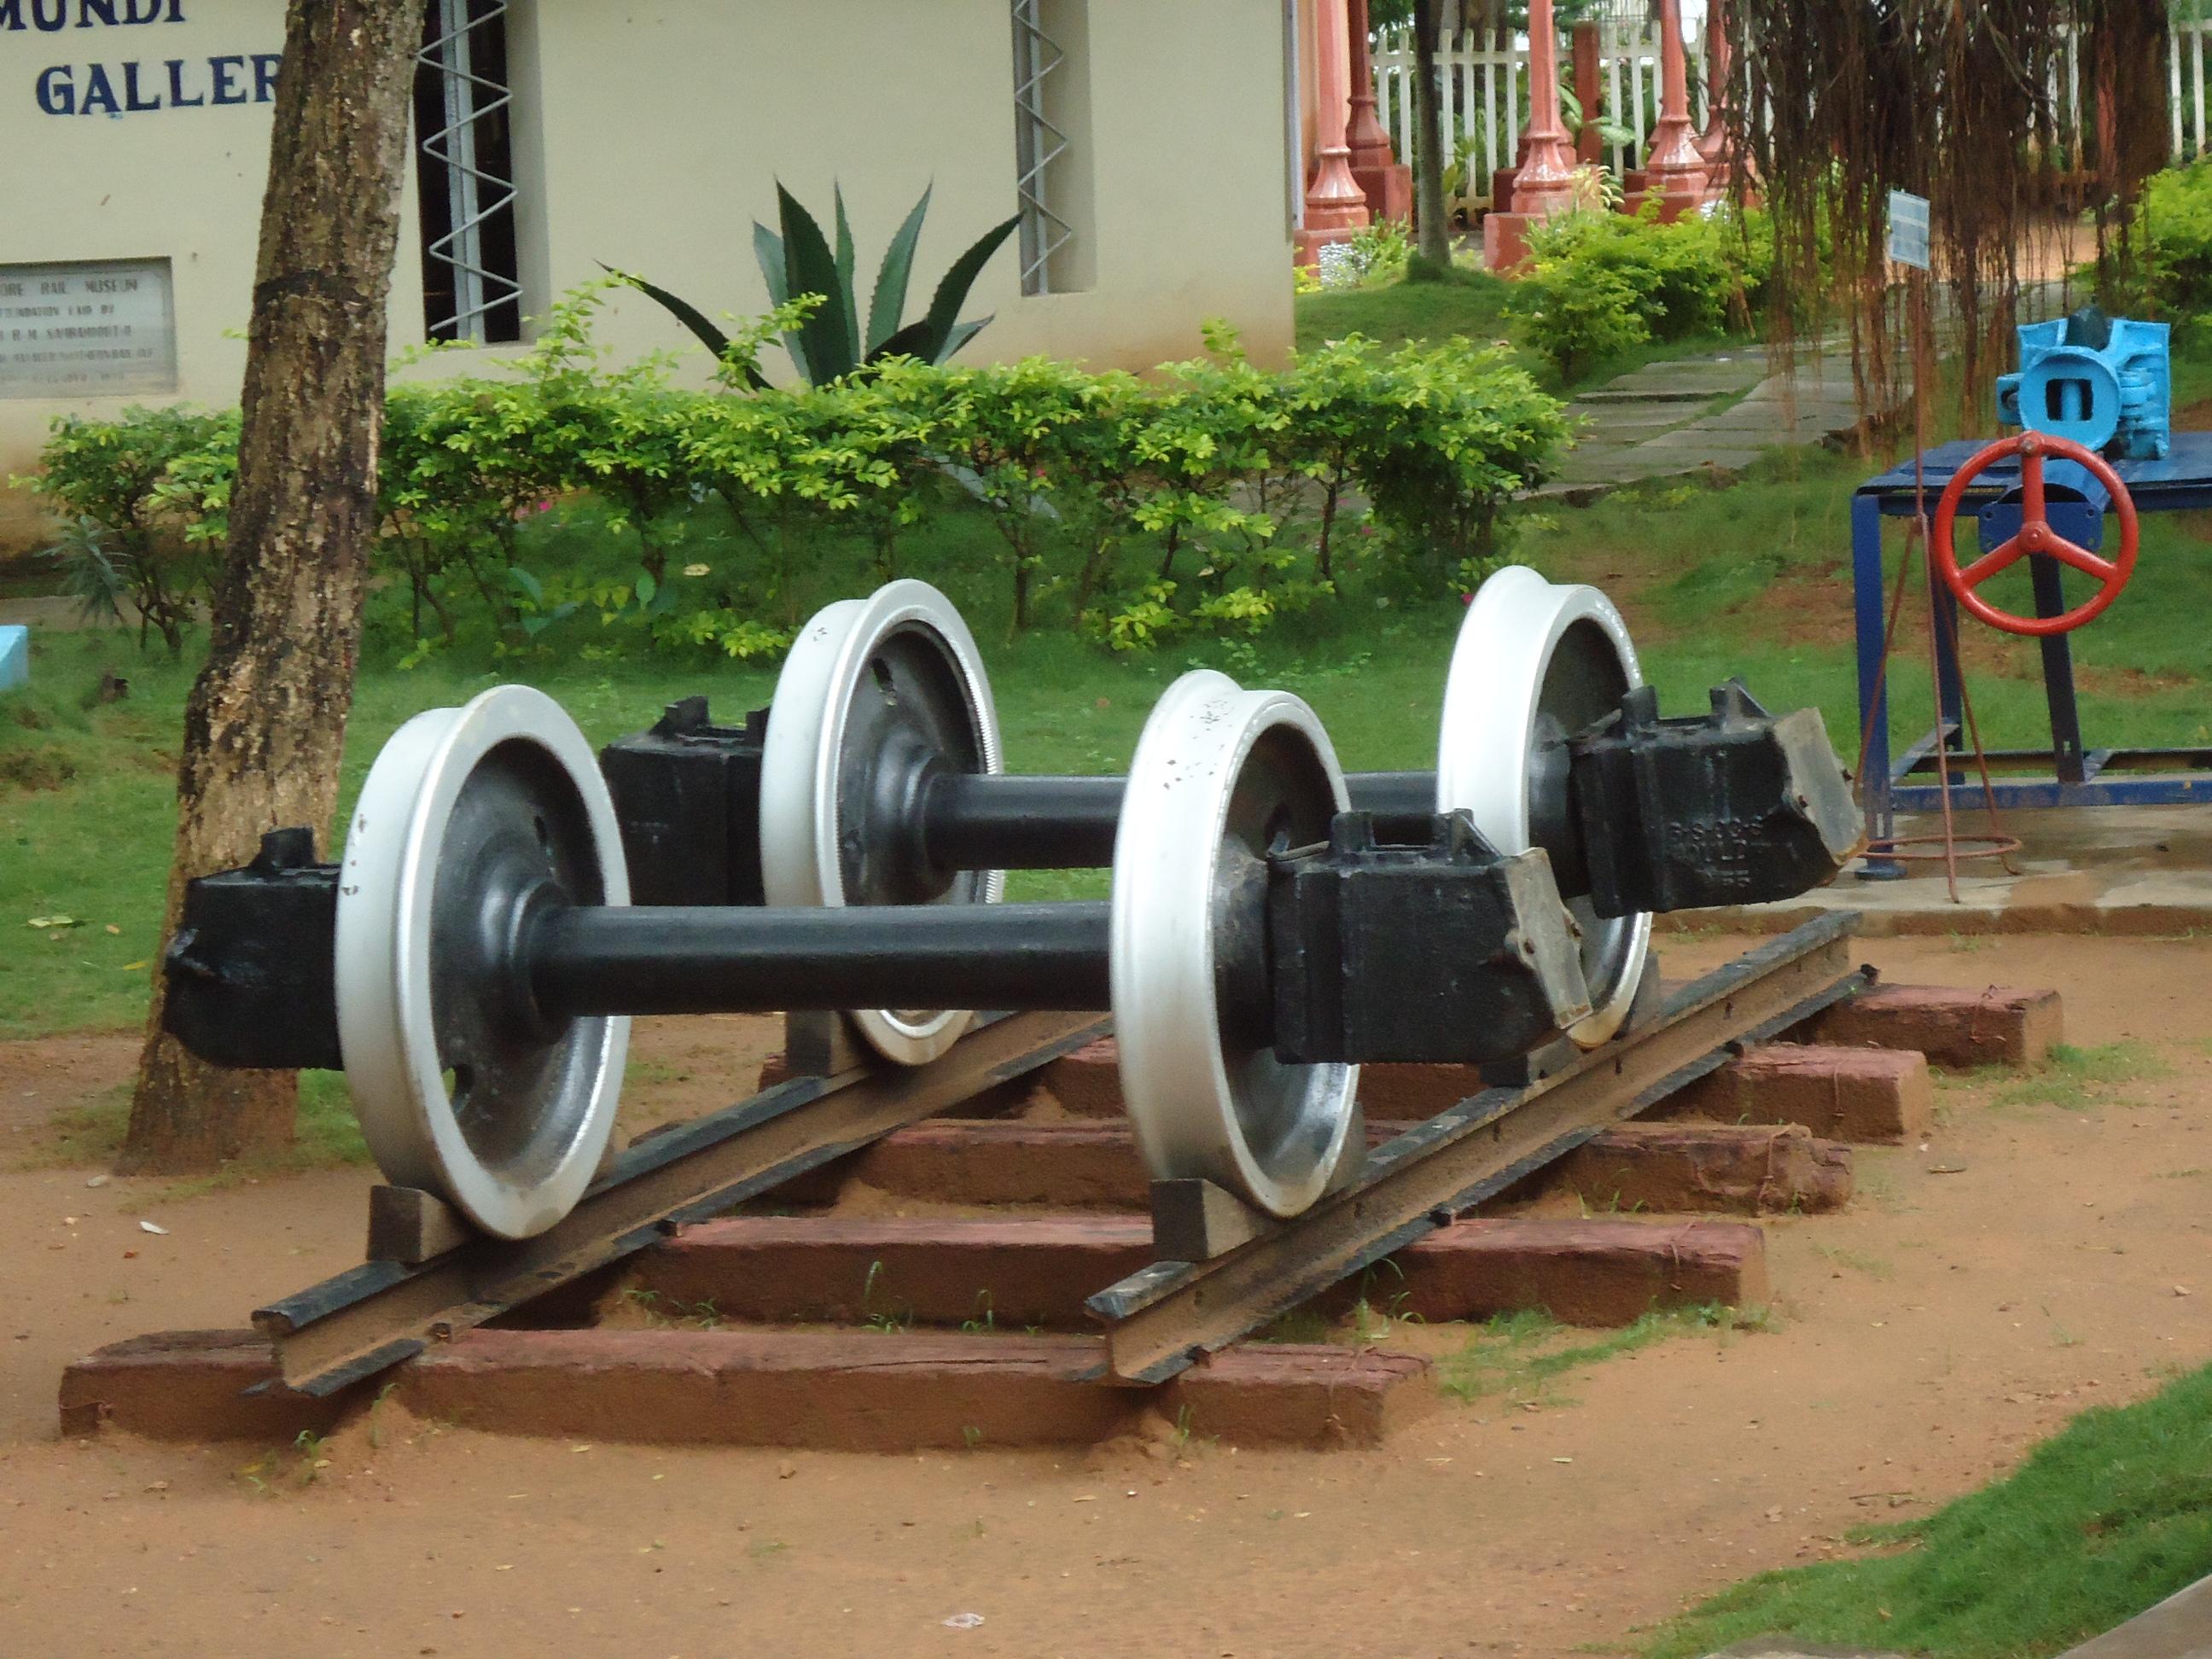 File:Mysore Rail Museum Train Wheels.JPG - Wikimedia Commons